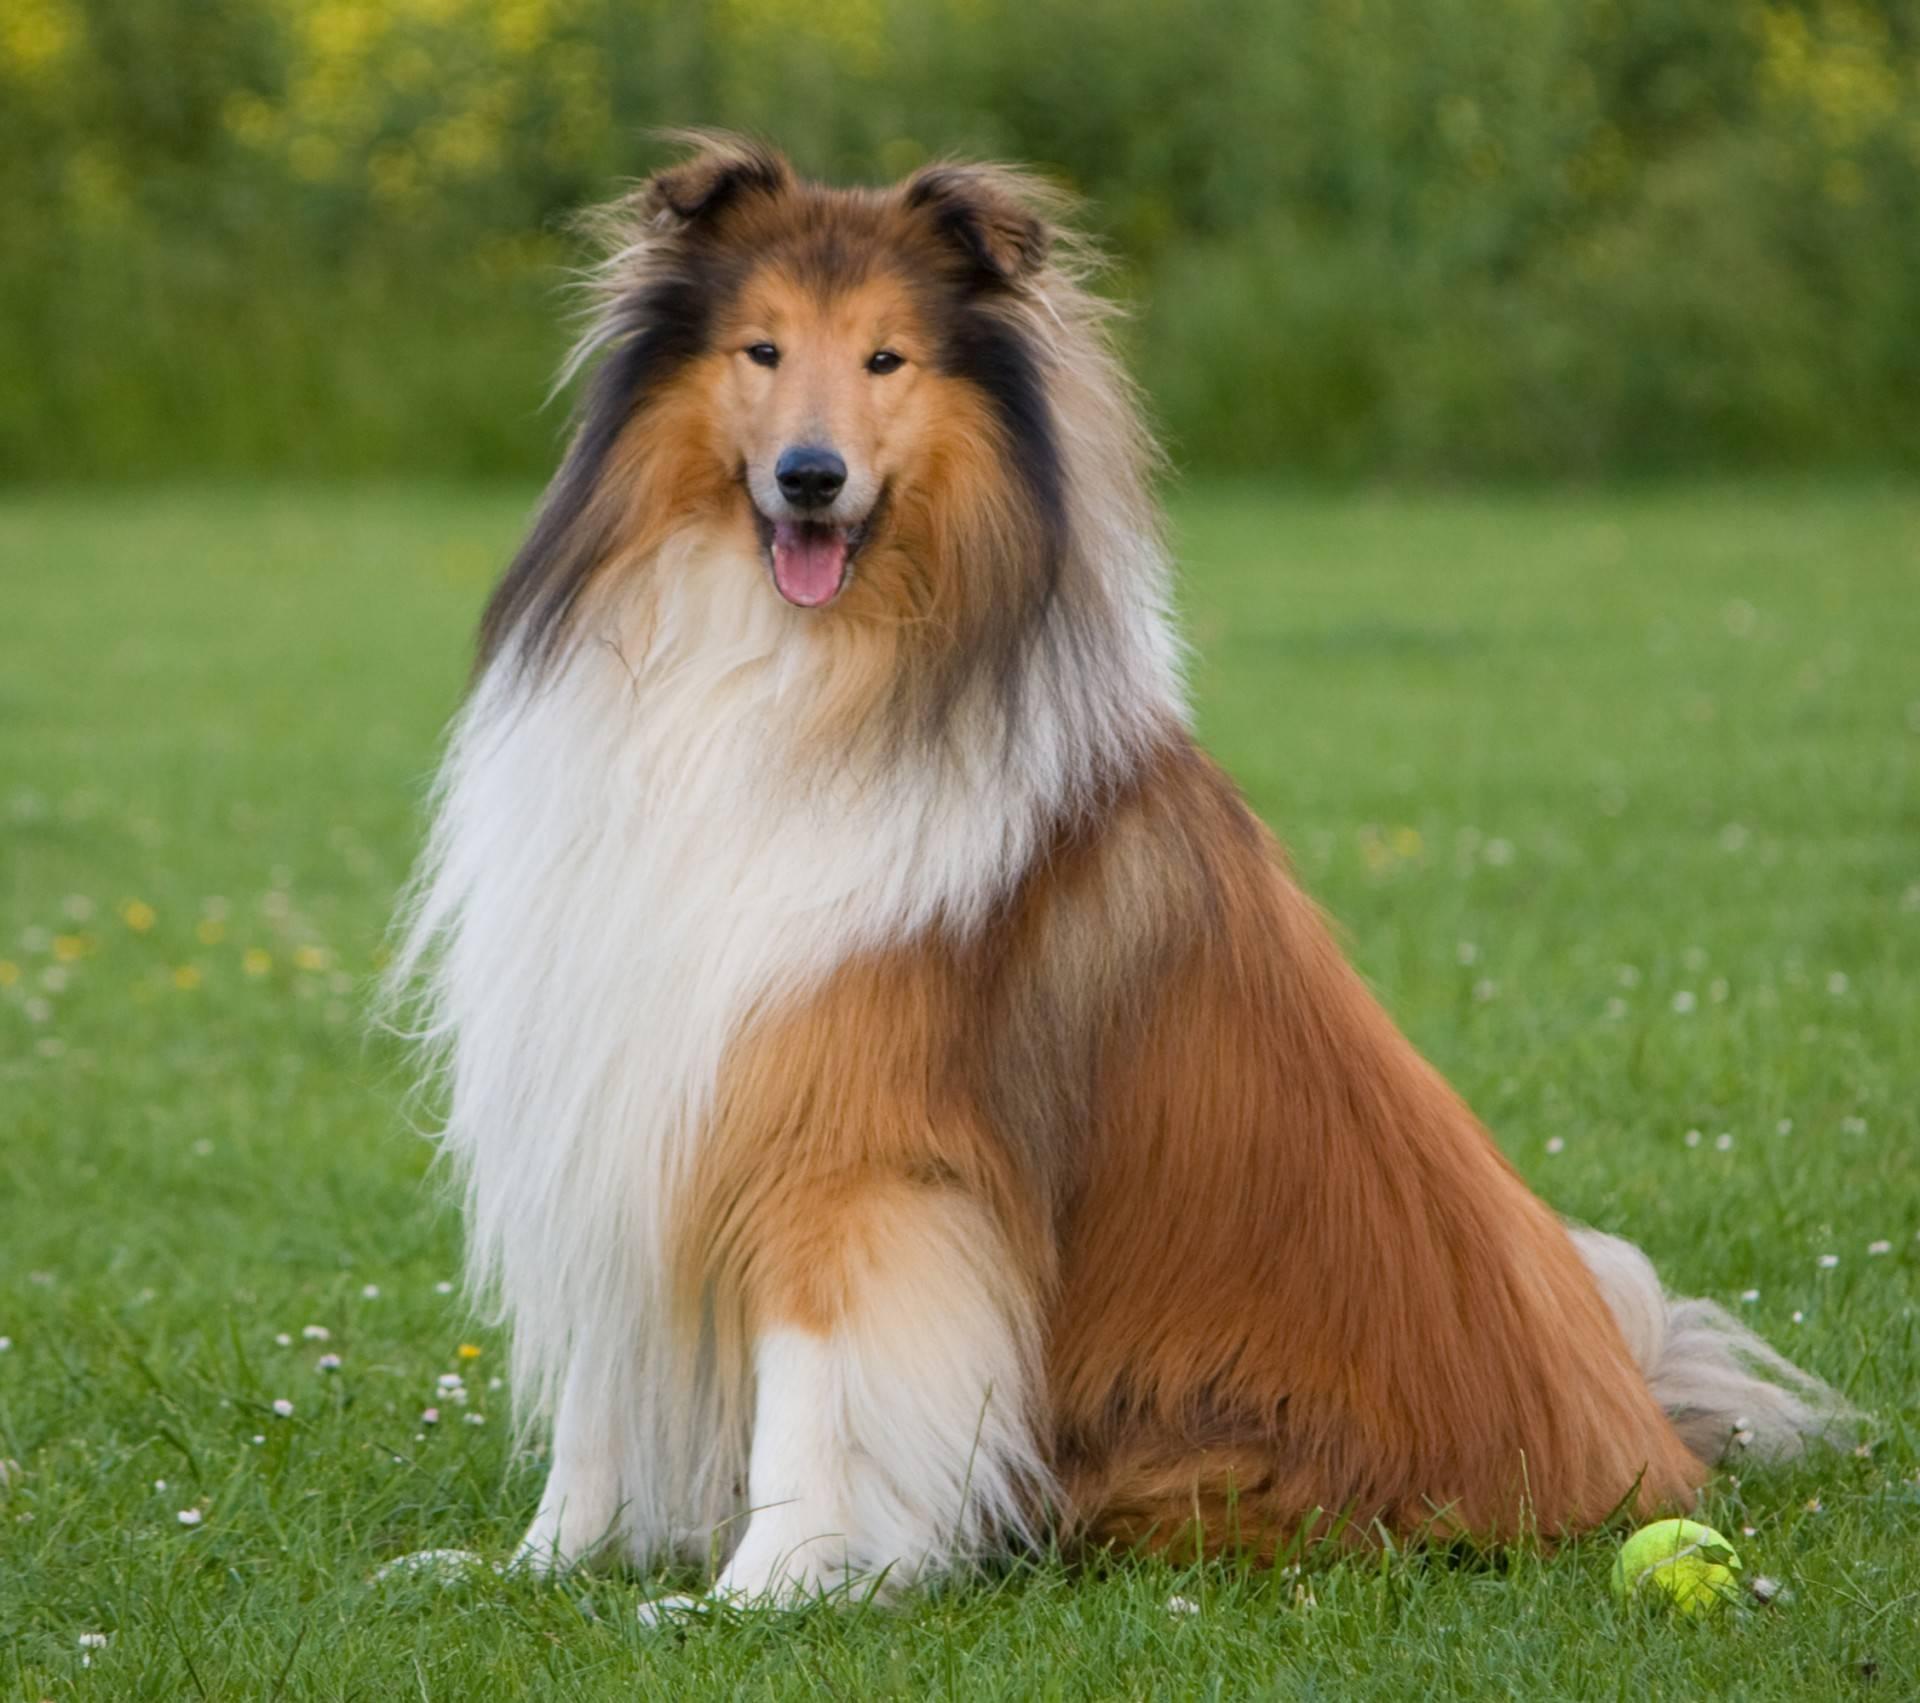 Шелти, или мини-колли – шотландская порода: характеристика собаки, внешний вид, характер и поведение, содержание и уход